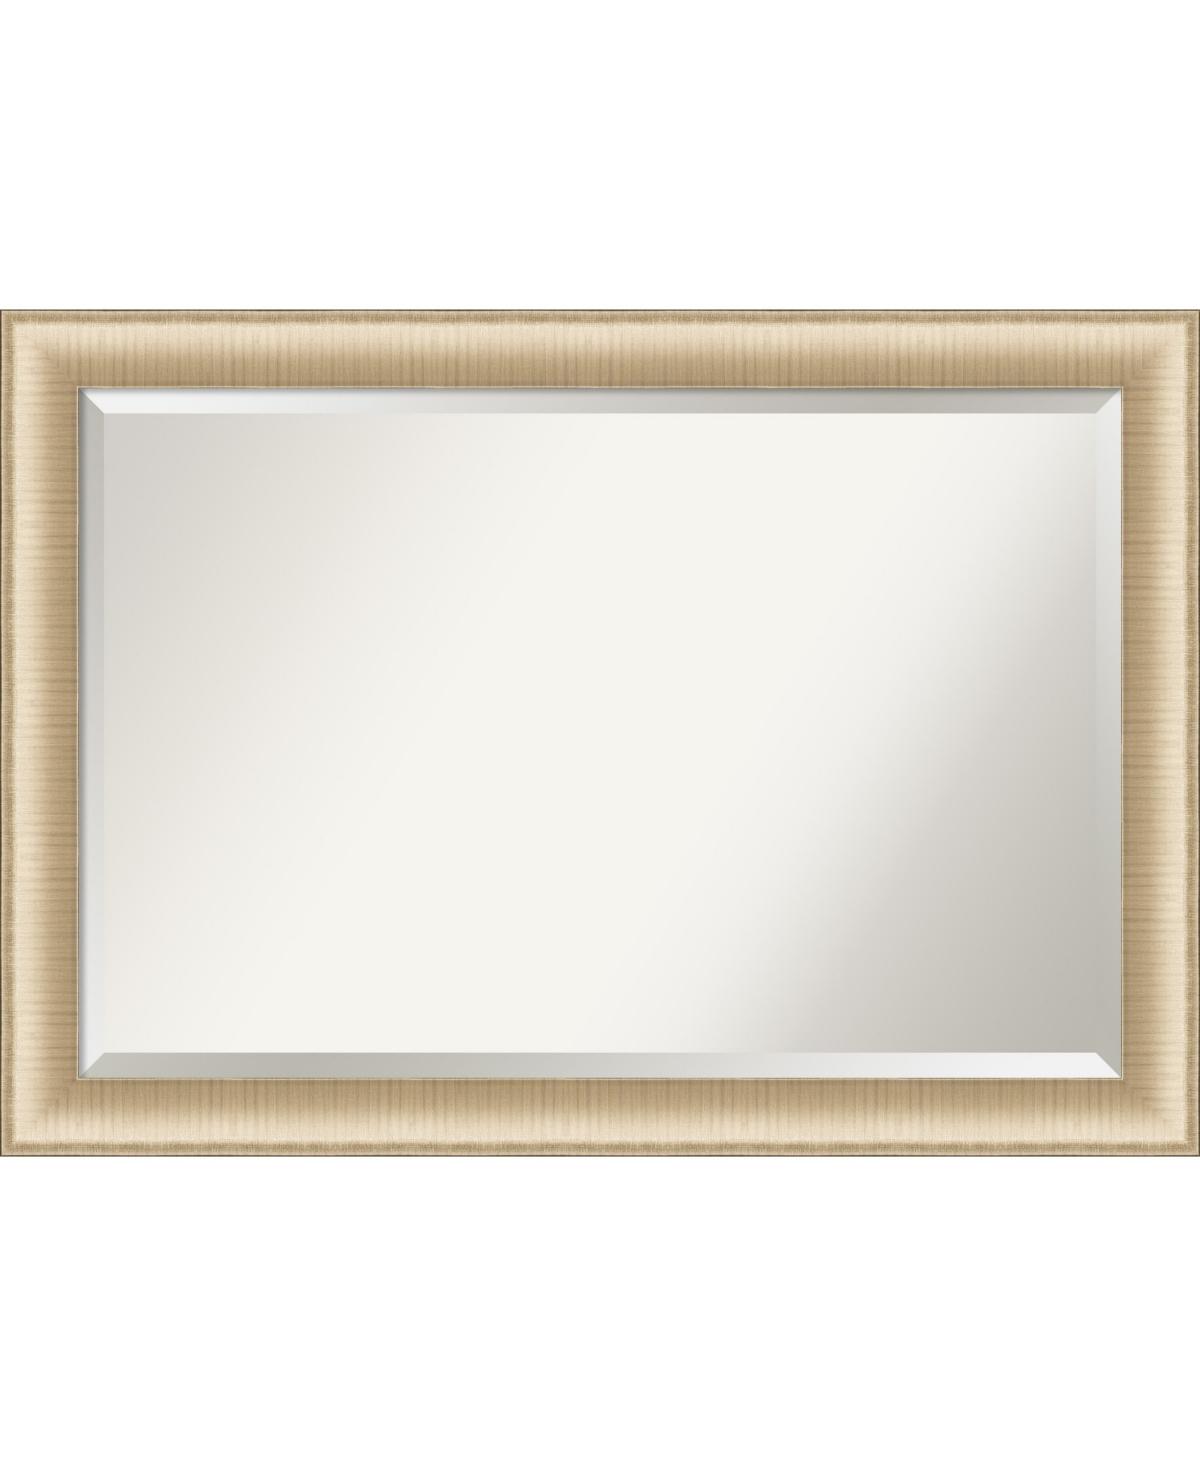 Amanti Art Elegant Brushed Honey Framed Bathroom Vanity Wall Mirror, 40.75